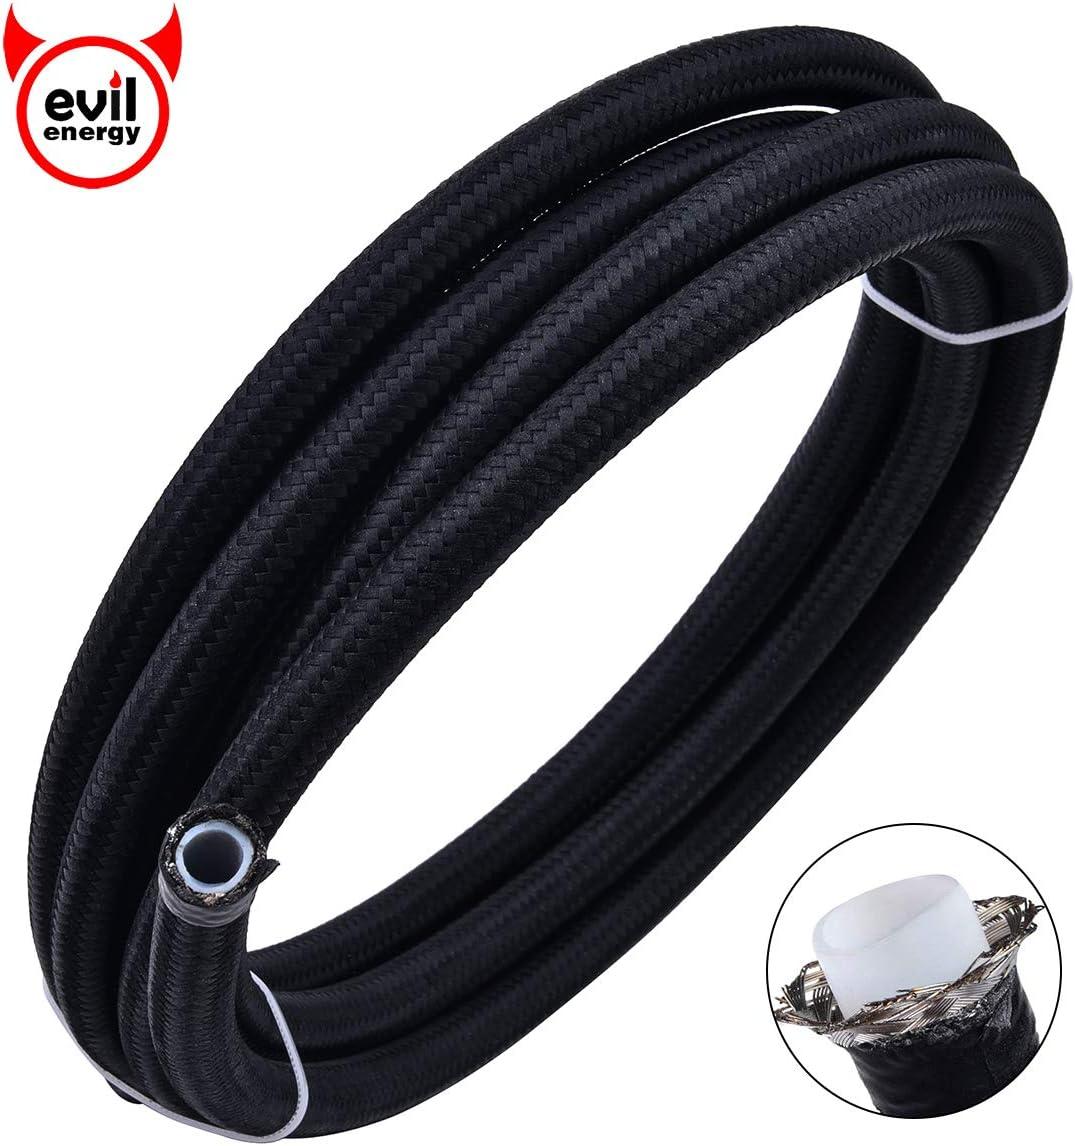 "EVIL ENERGY 10FT 8AN 1/2"" PTFE Fuel Line E85 Tube Nylon Stainless Steel Braided Universal Black (10.7mm ID)"